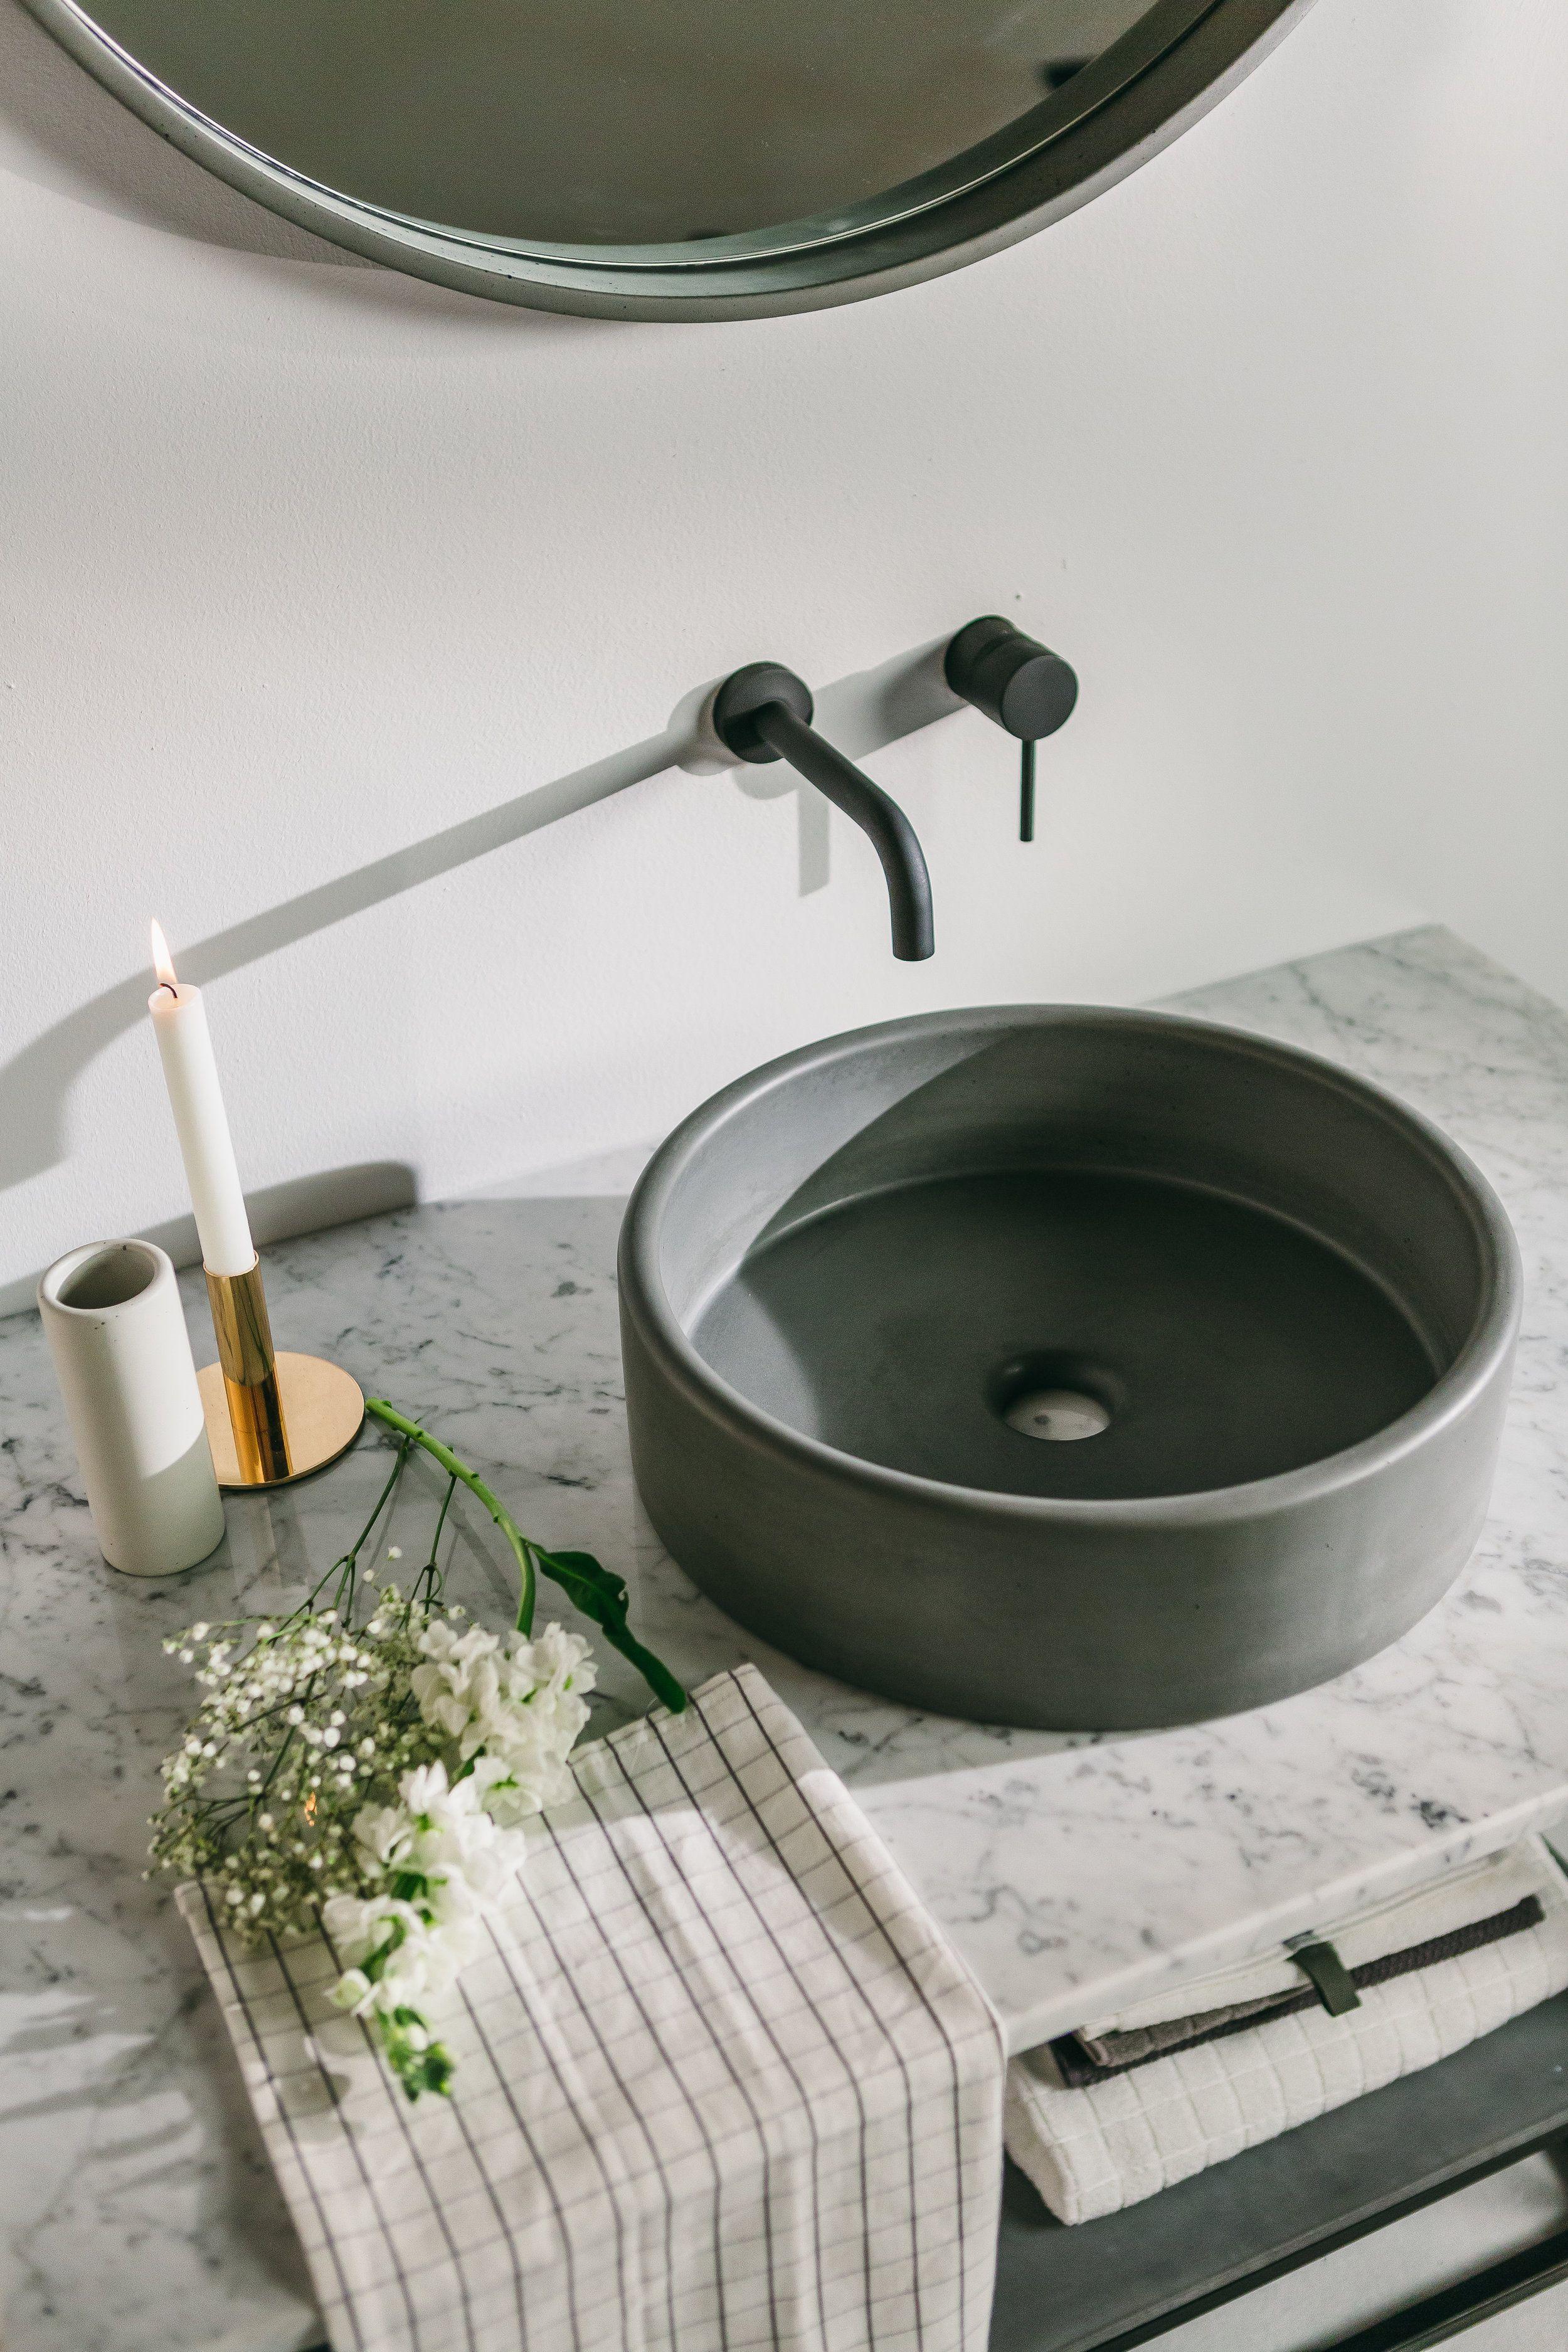 Nood Photoshoot 150 Jpg Concrete Bathroom Bathroom Sink Bowls Small Bathroom Sinks